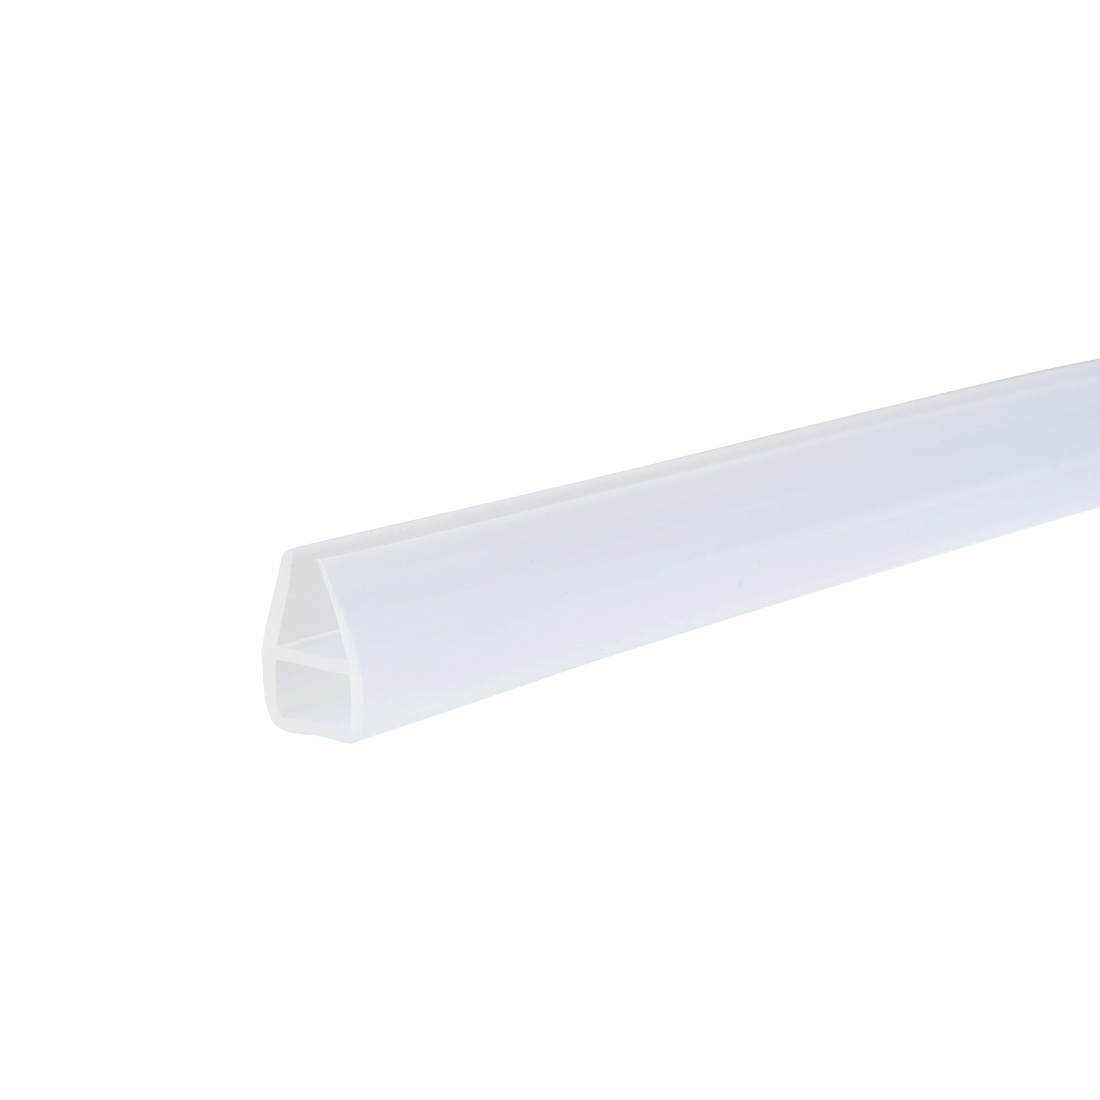 36-inch U Shaped Frameless Window Shower Door Seal Clear for 8mm Glass